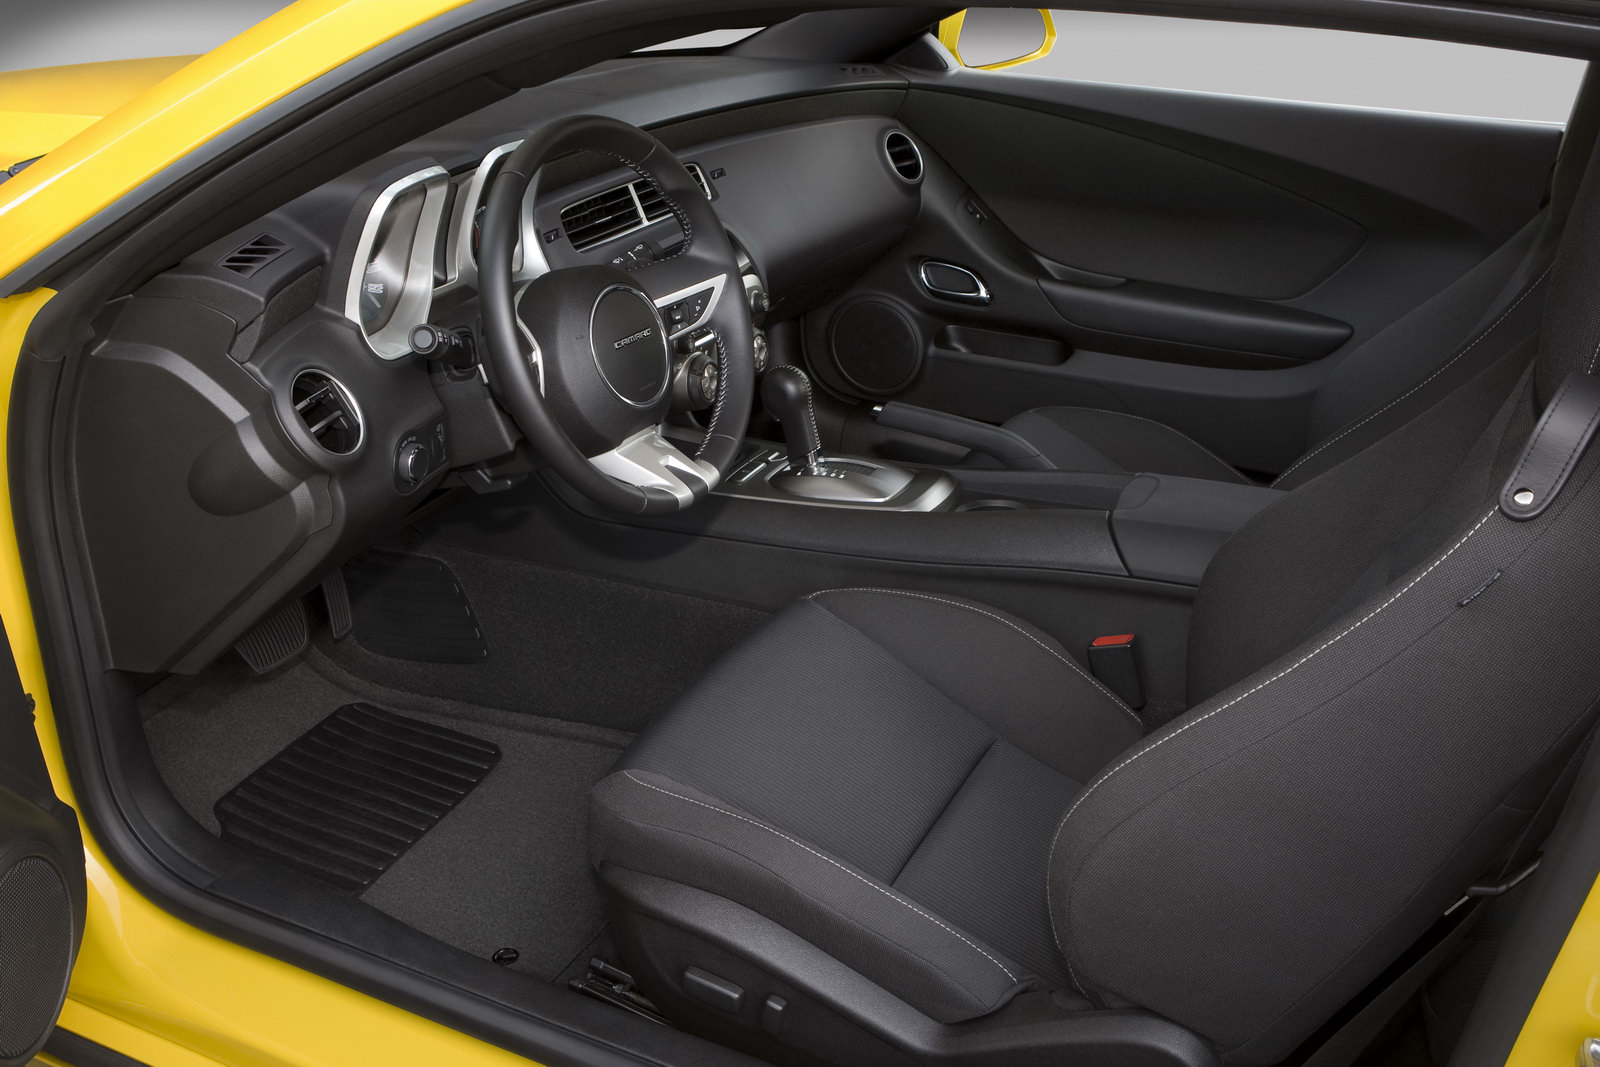 2012 camaro new interior z 28 possibly showing up for Interior 86 camaro